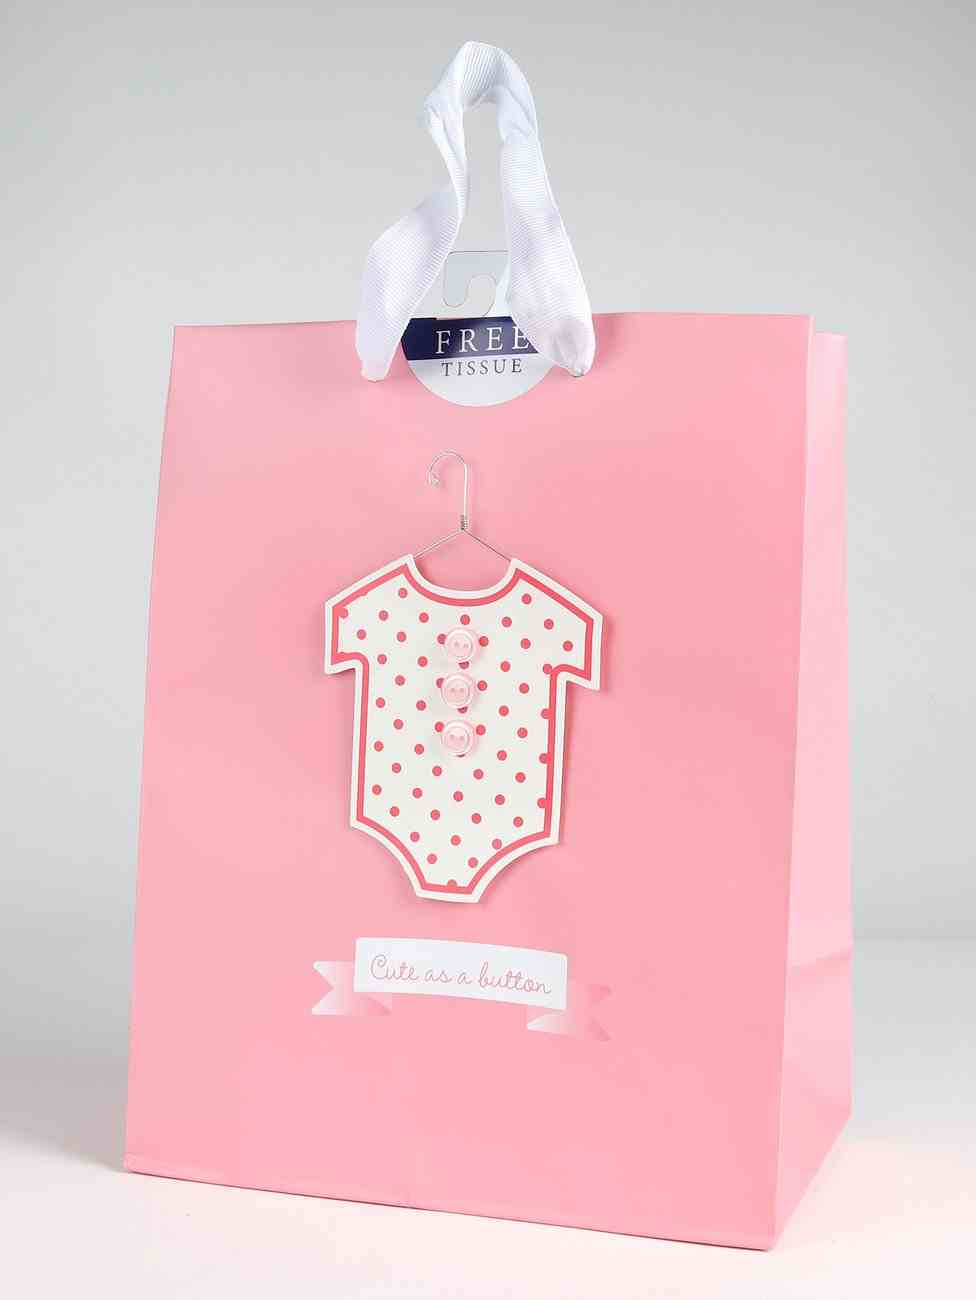 Gift Bag Medium: Baby Pink Polka Dot (Incl Two Sheets Tissue Paper & Gift Tag) Stationery